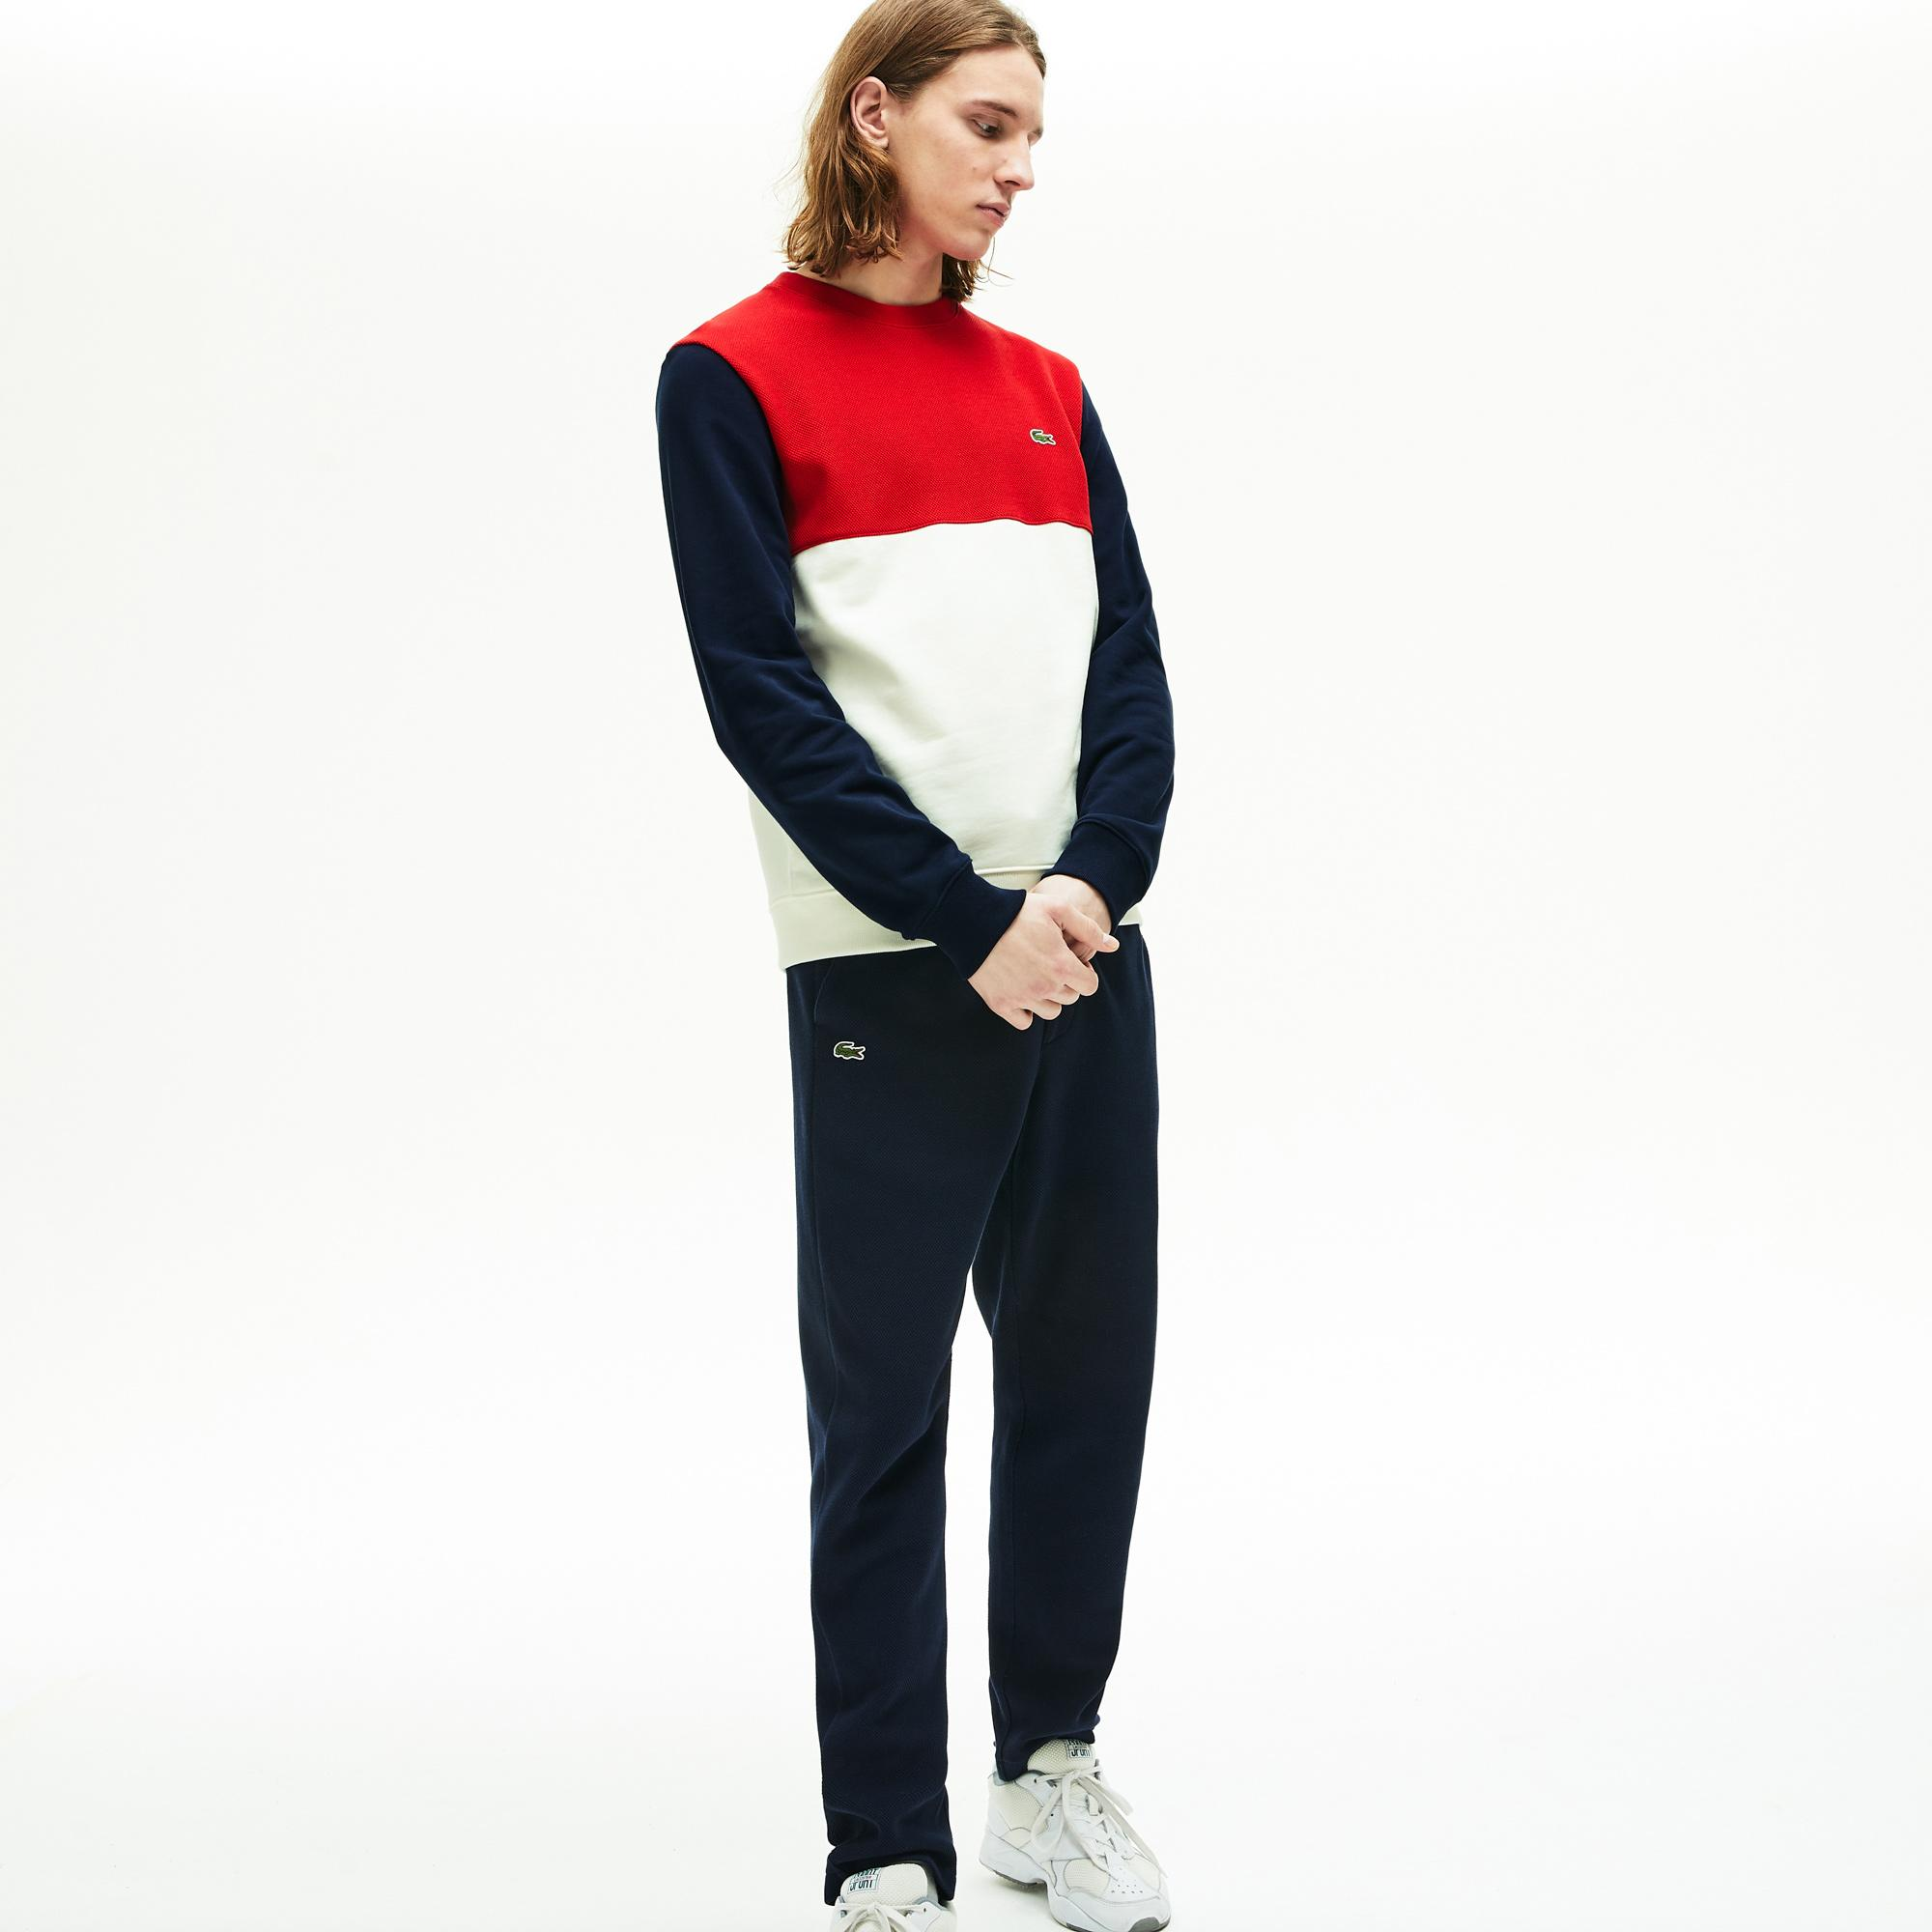 Lacoste Erkek Bisiklet Yaka Blok Desenli Renkli Sweatshirt